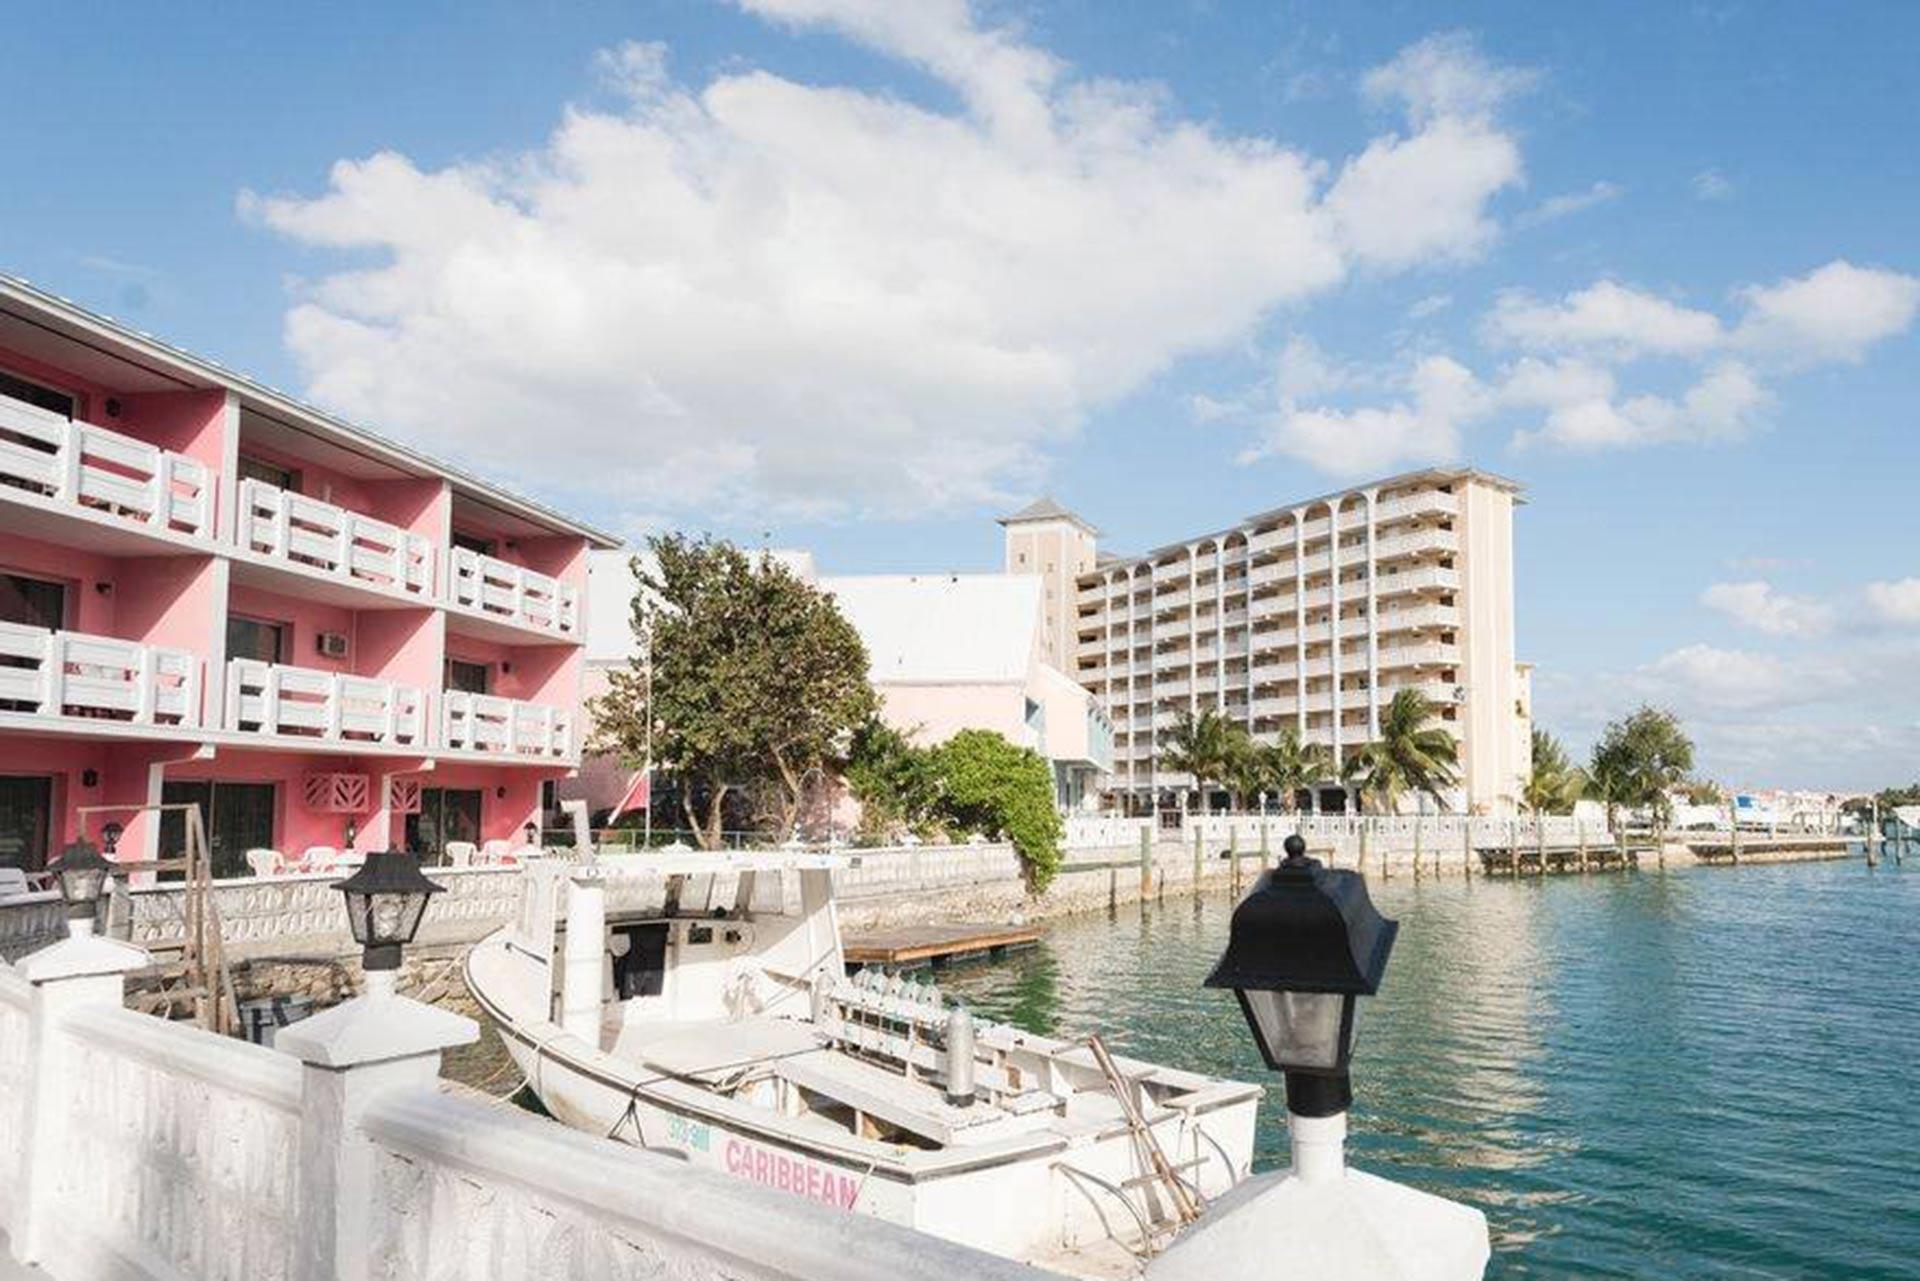 Bell Channel Inn on Grand Bahama Island in the Bahamas